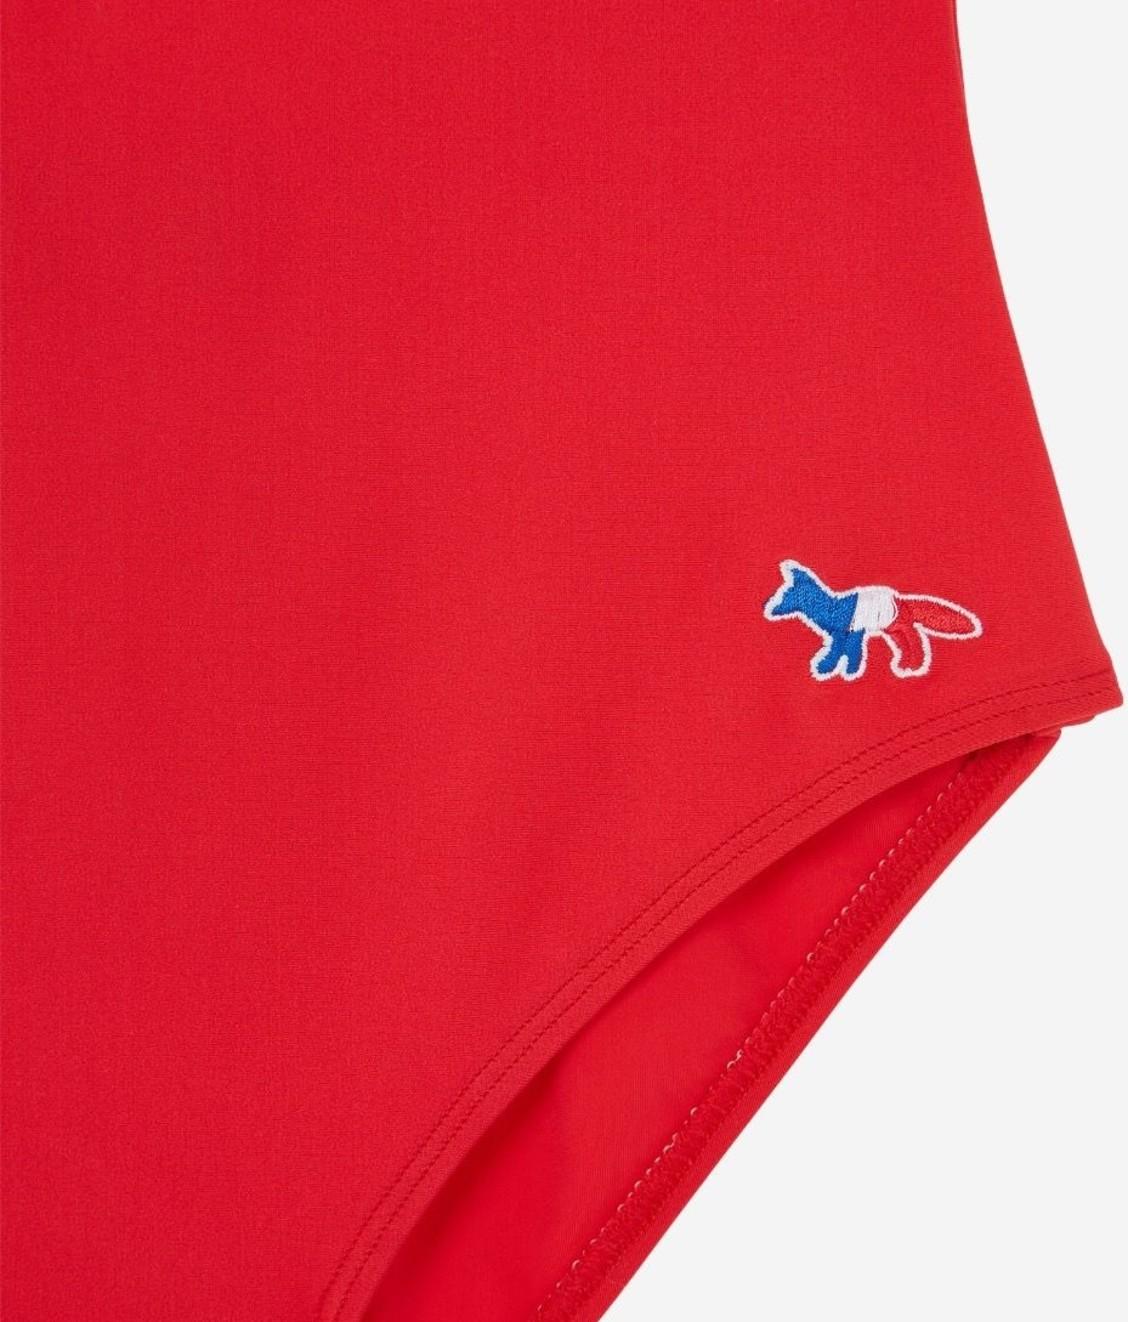 Maison Kitsune Maison Kitsune Tricolor Fox Onepiece Red